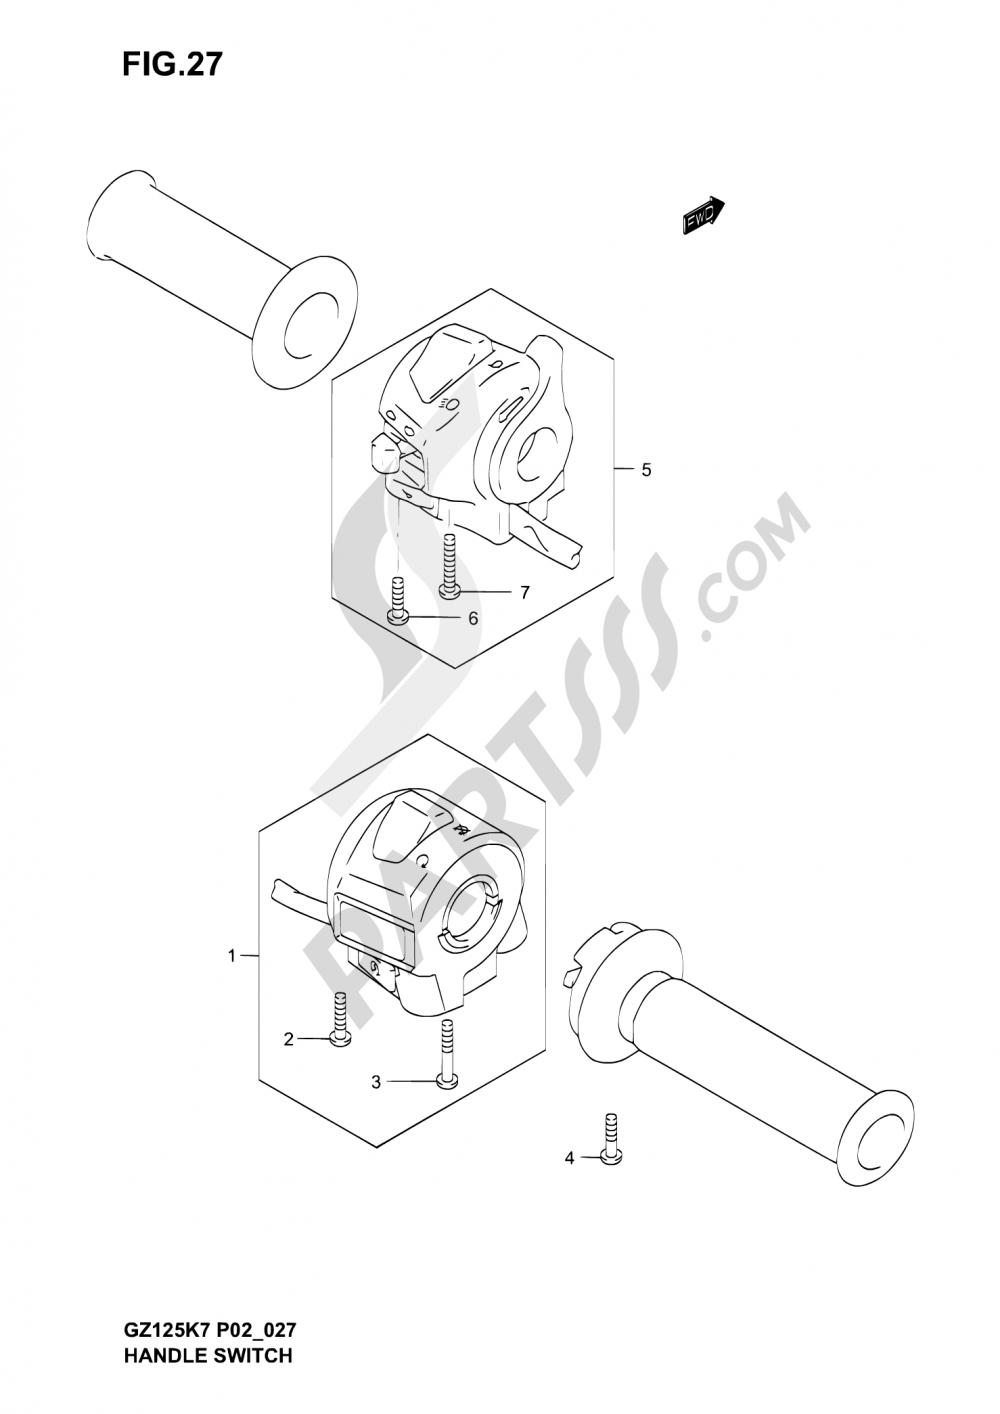 27 - HANDLE SWITCH (MODEL K3/K4/K5/K6) Suzuki MARAUDER GZ125 2006